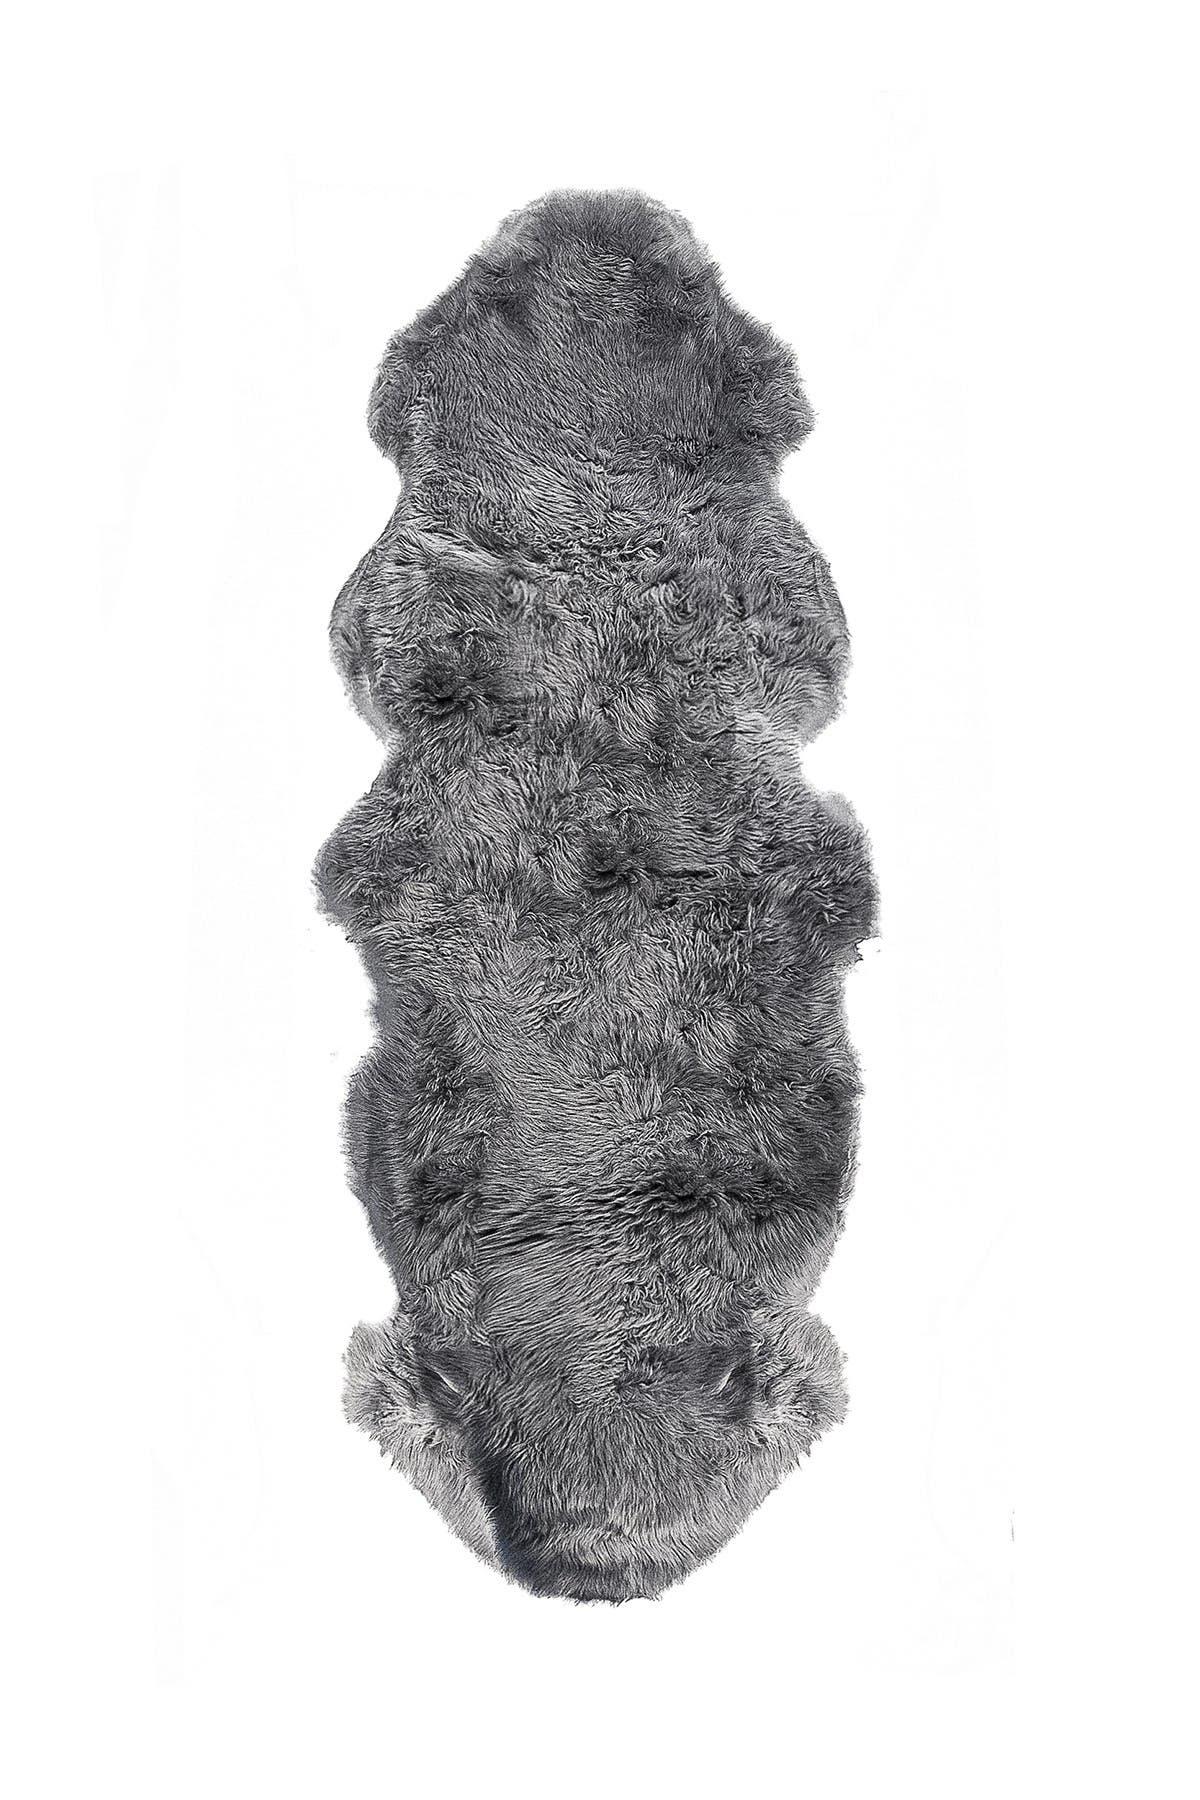 Image of Natural New Zealand Genuine Sheepskin Rug - 2ft x 6ft - Grey